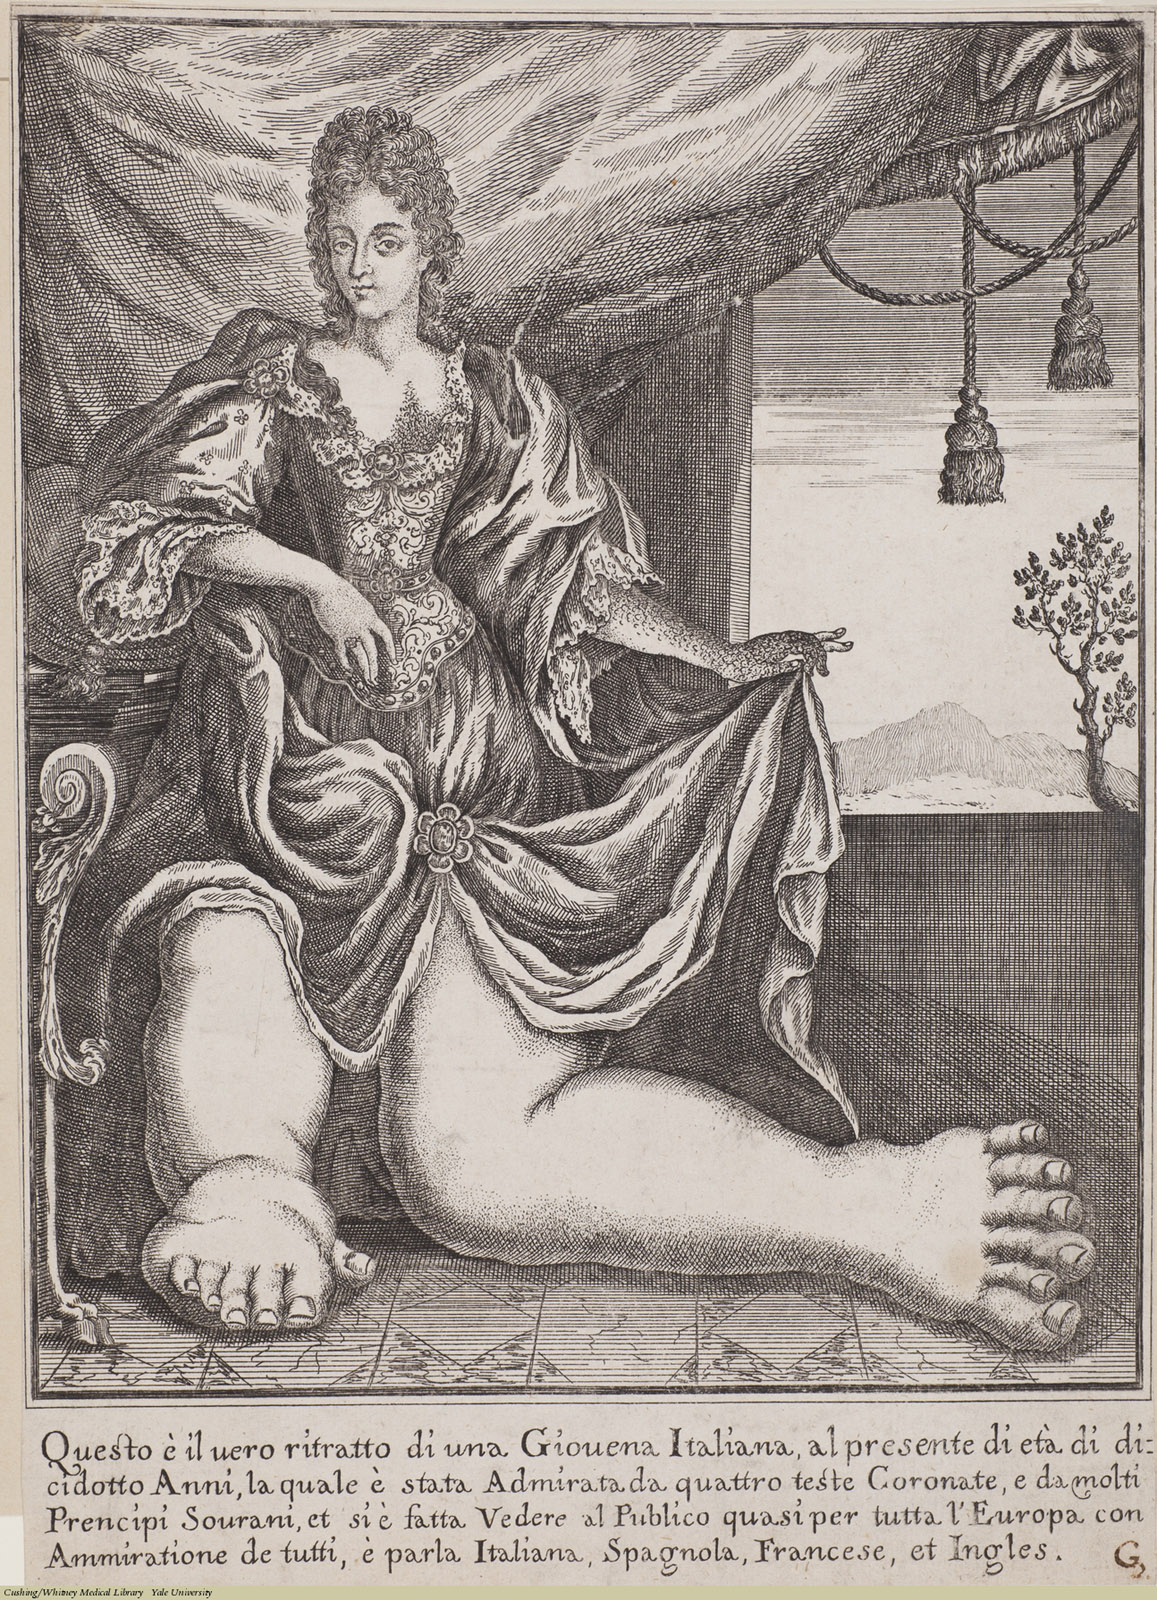 Woman with Elephantiasis, Laid, Anonymous, Italian, 18th Century.